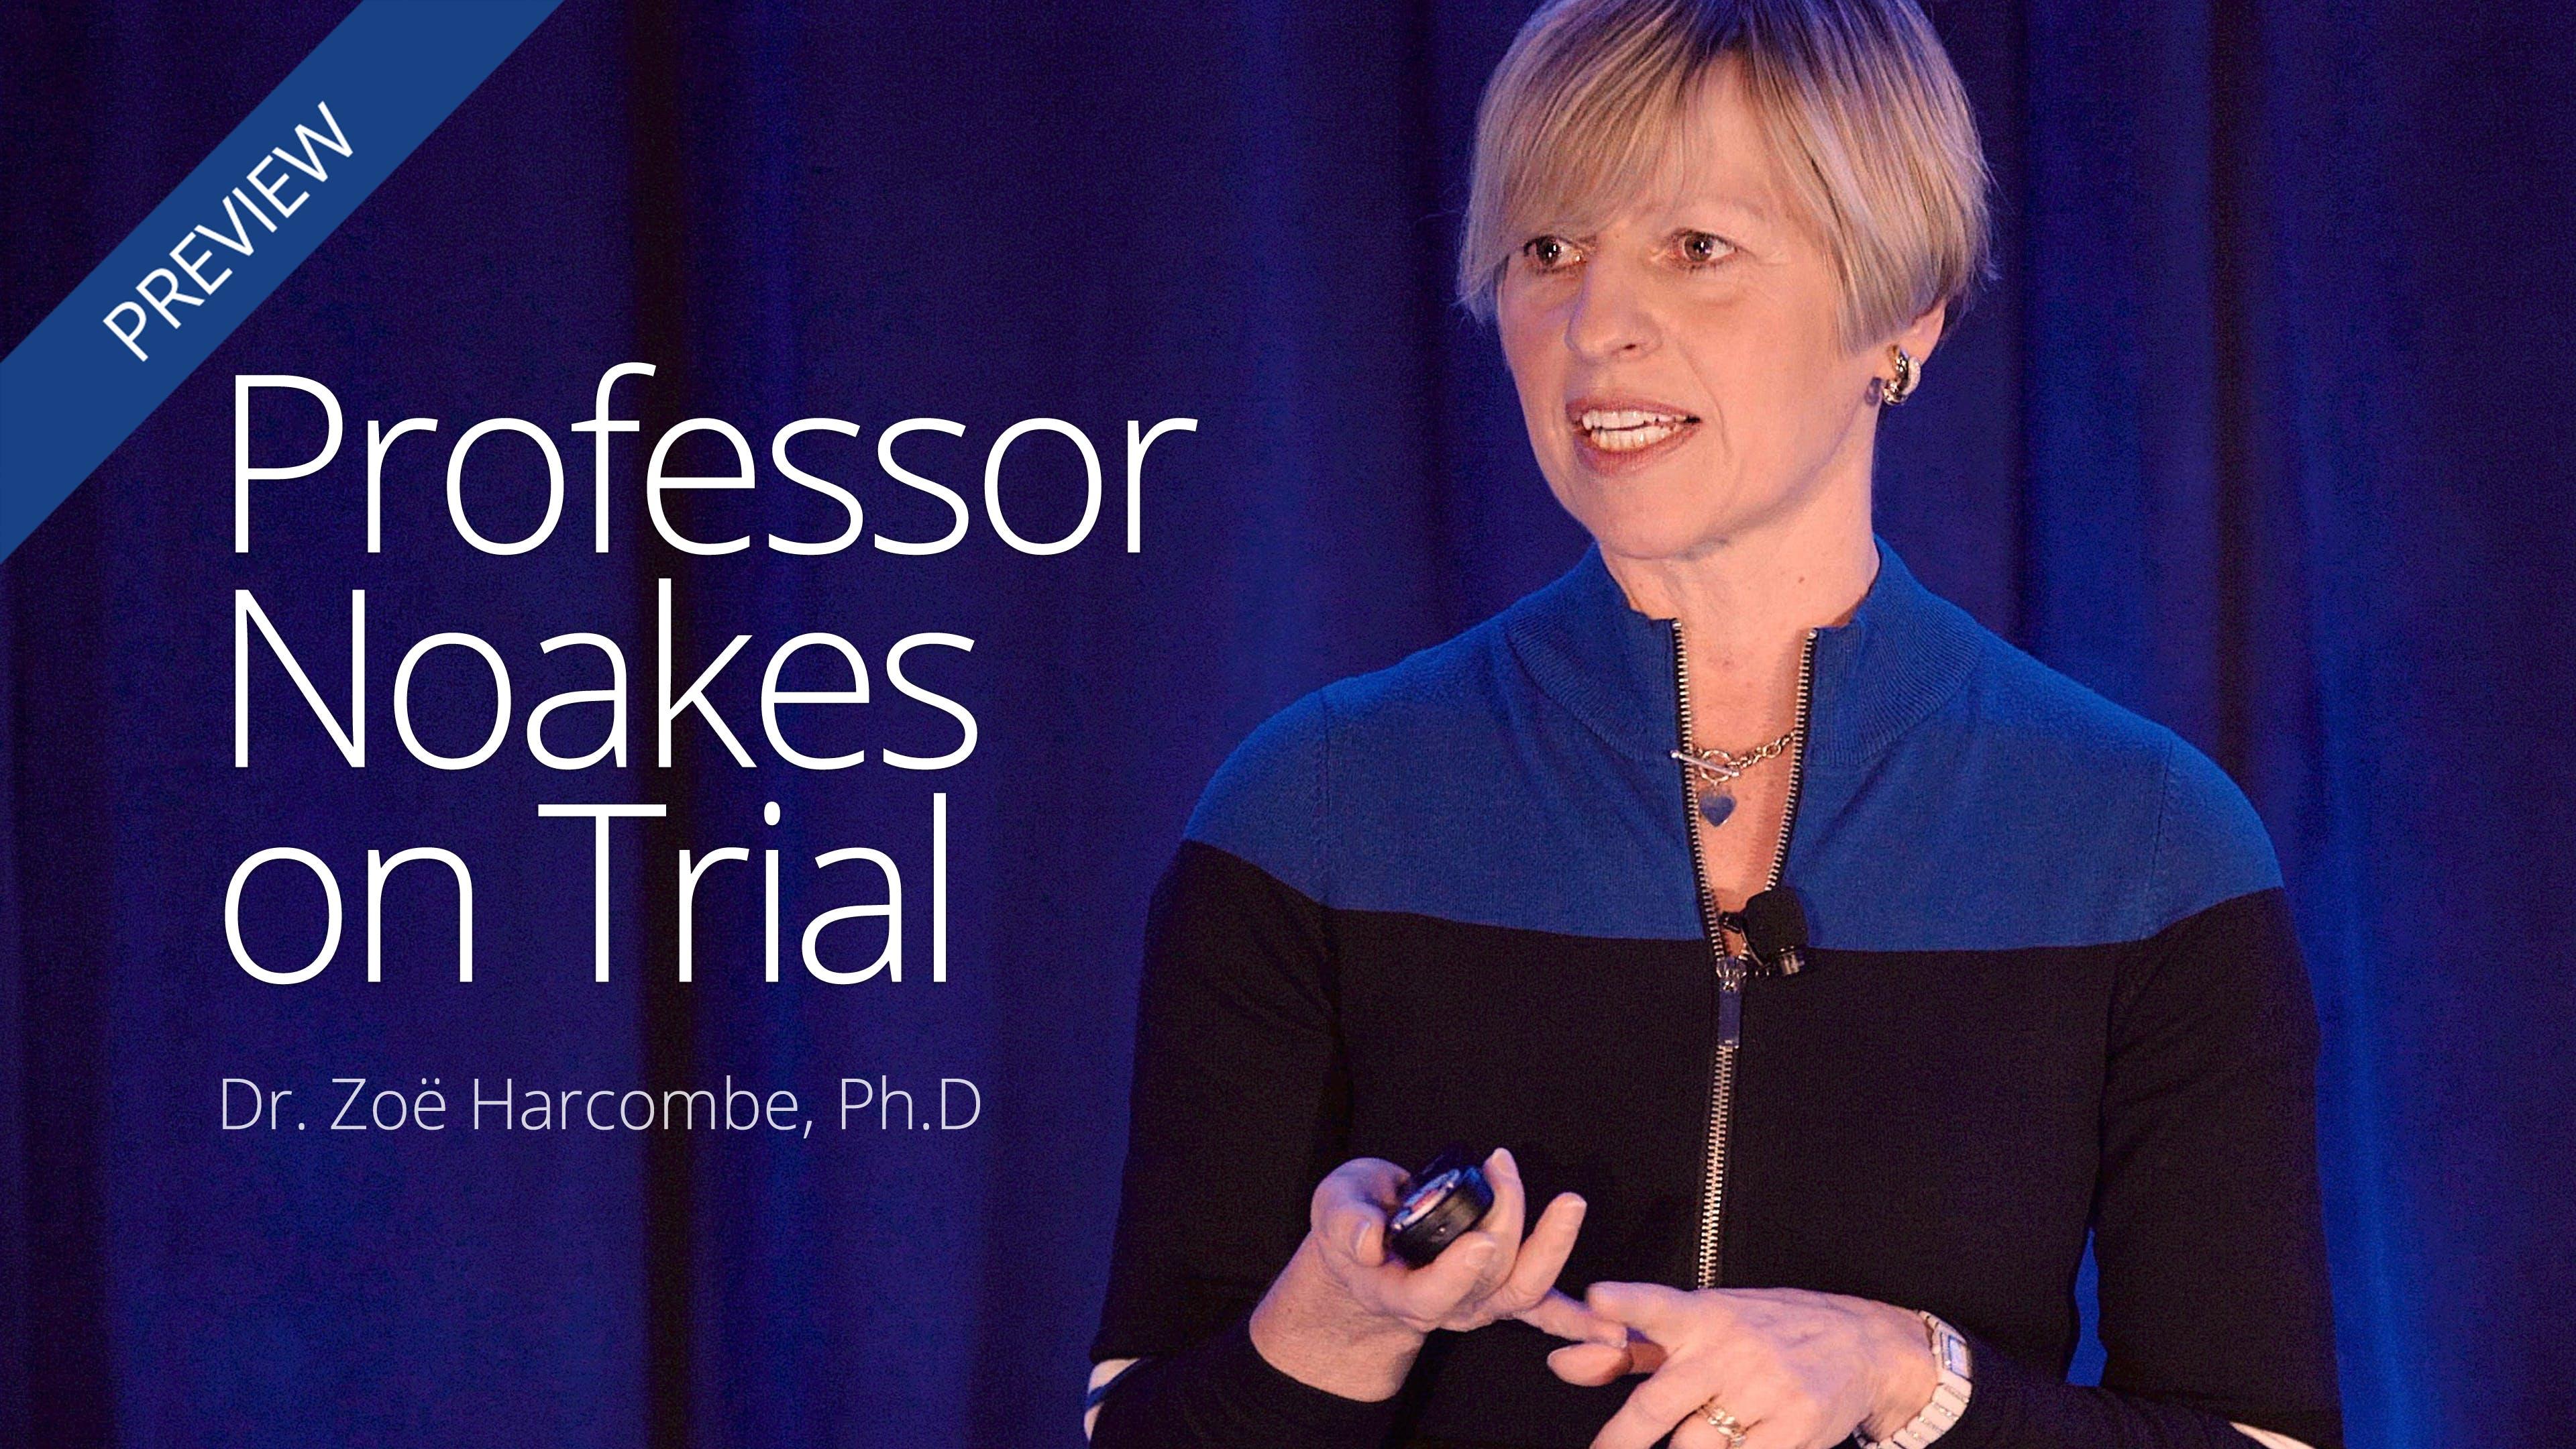 Professor Noakes on trial